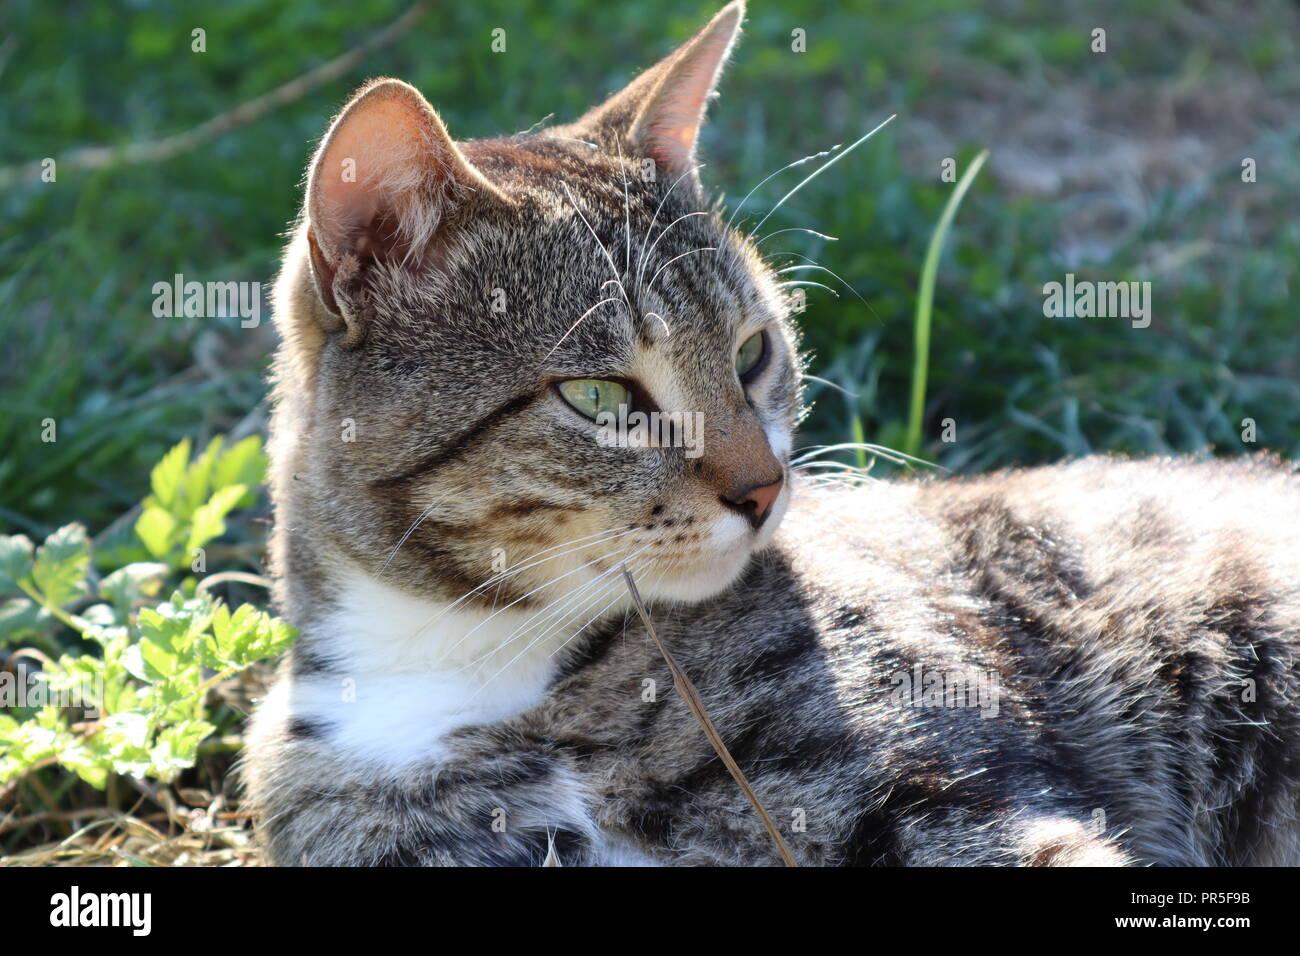 Gray cat basking in the sun - Stock Image